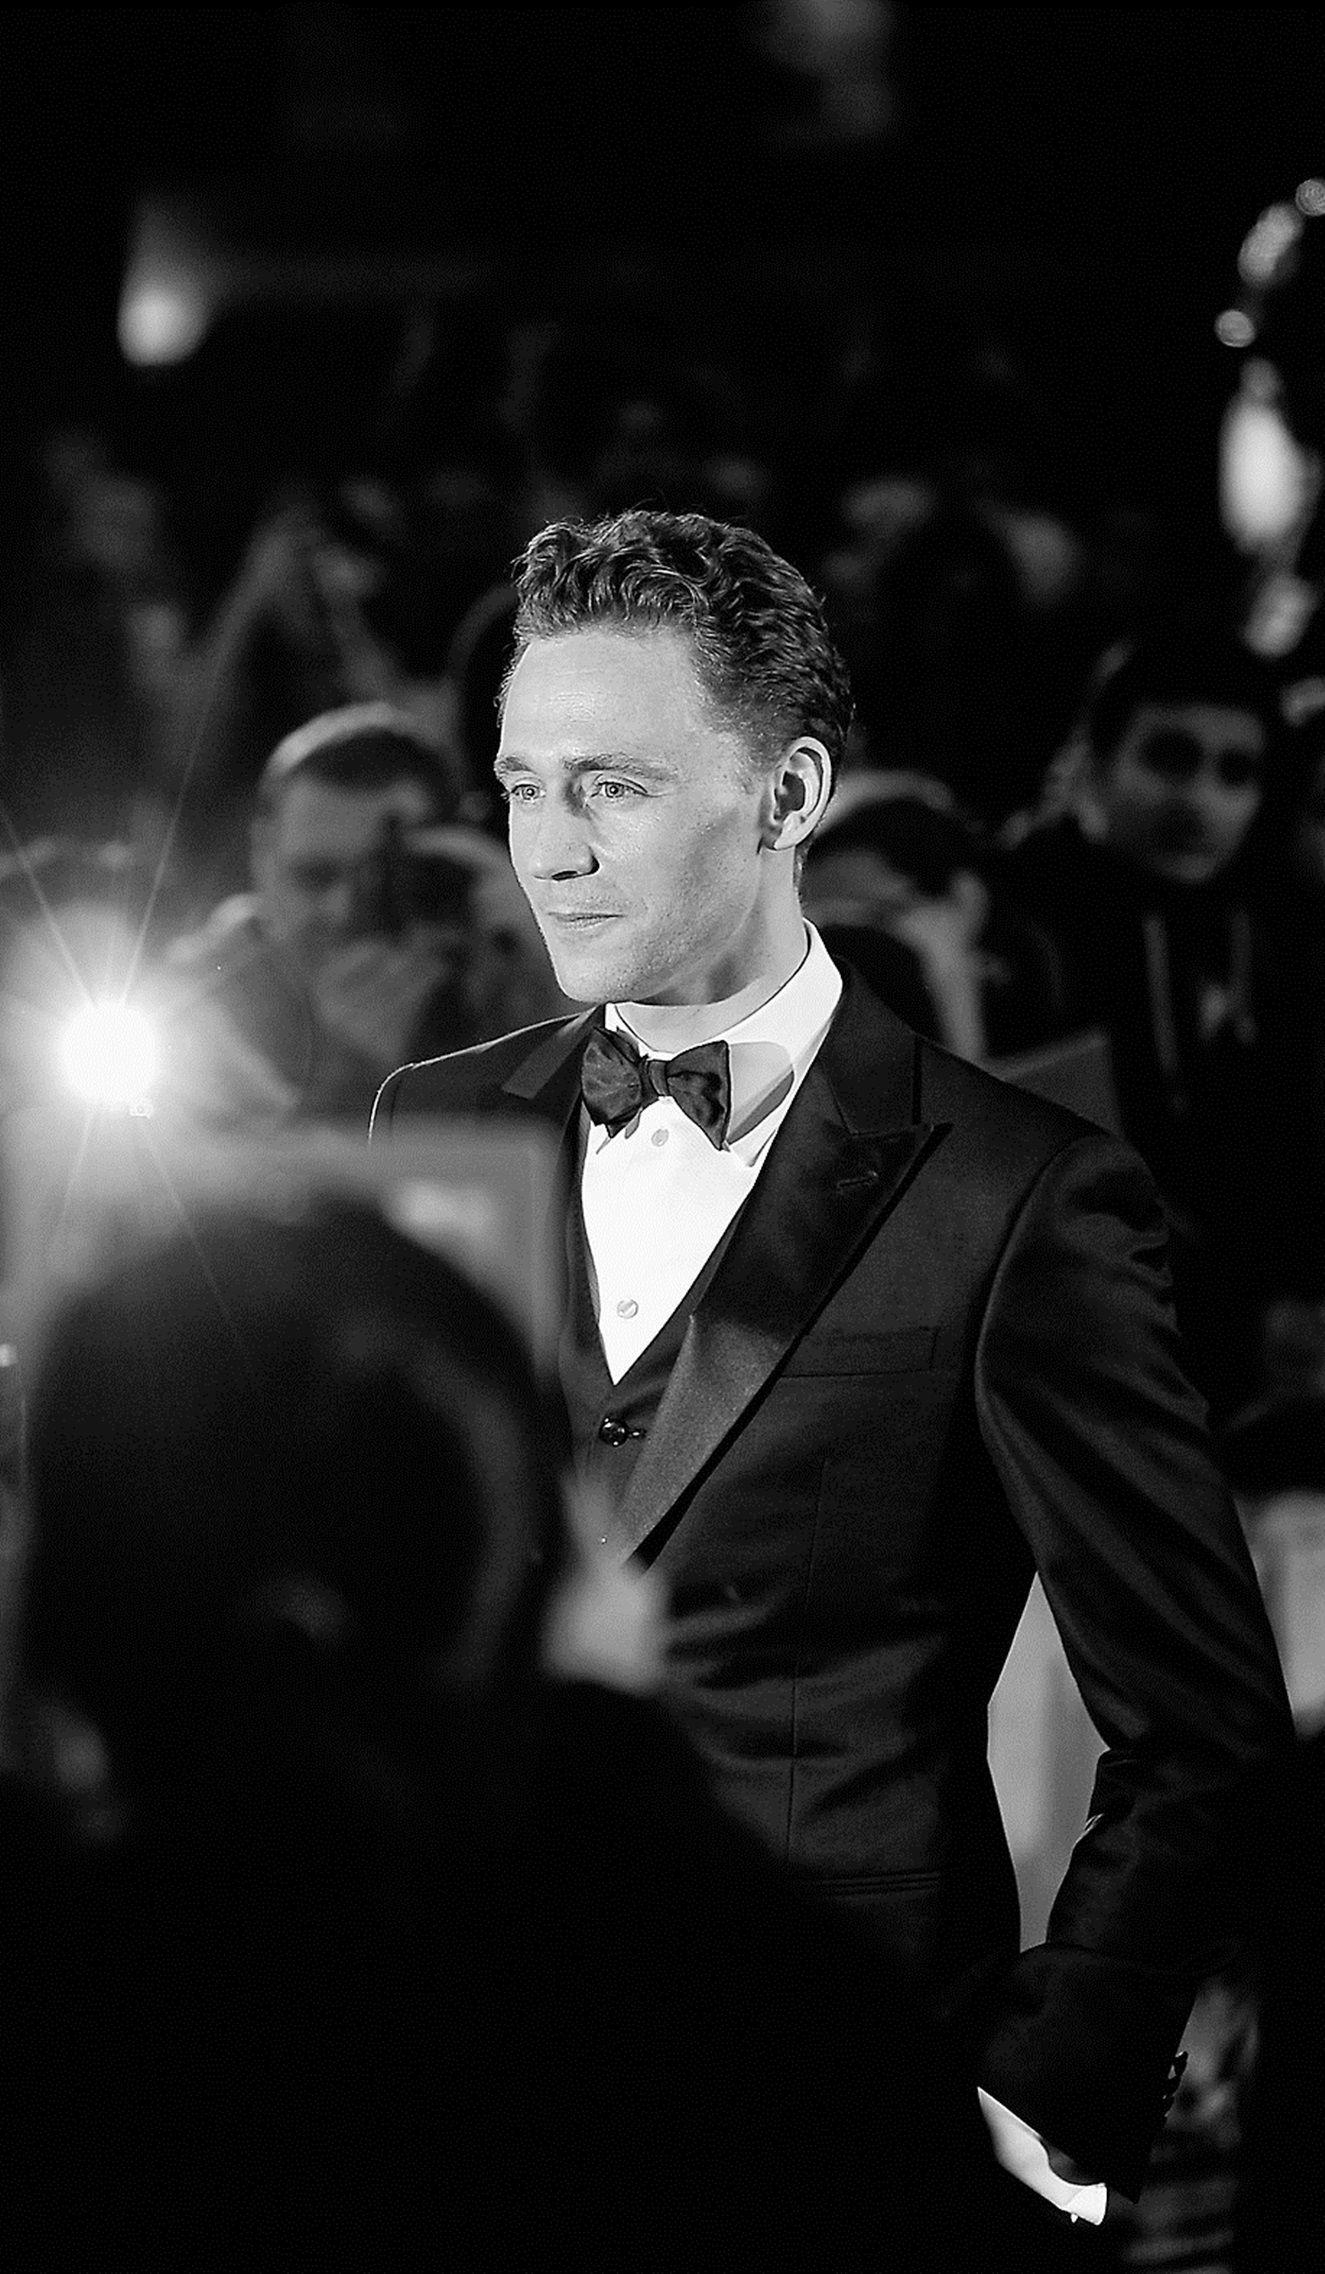 Luna Jun Lunastar1004 Tom Hiddleston Loki Actors Paraphrase Thu Conscience Doe Make Coward Of U All